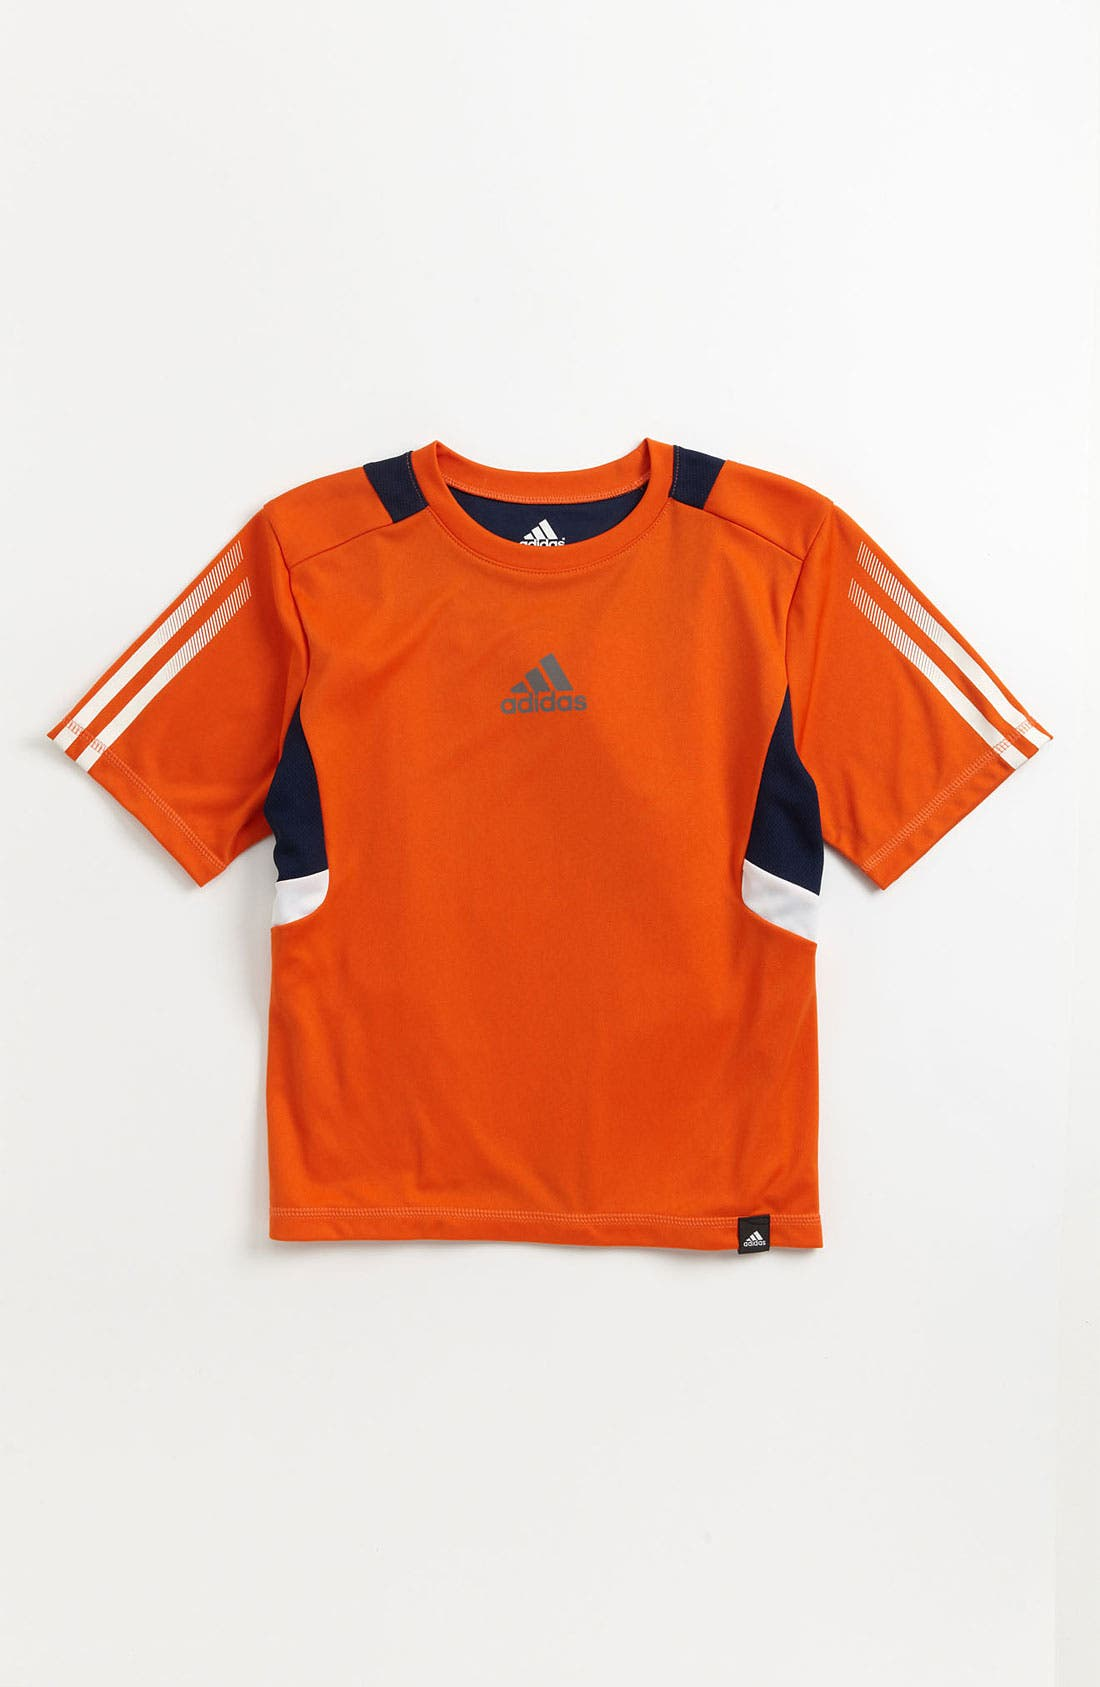 Alternate Image 1 Selected - adidas 'Energy' T-Shirt (Little Boys)